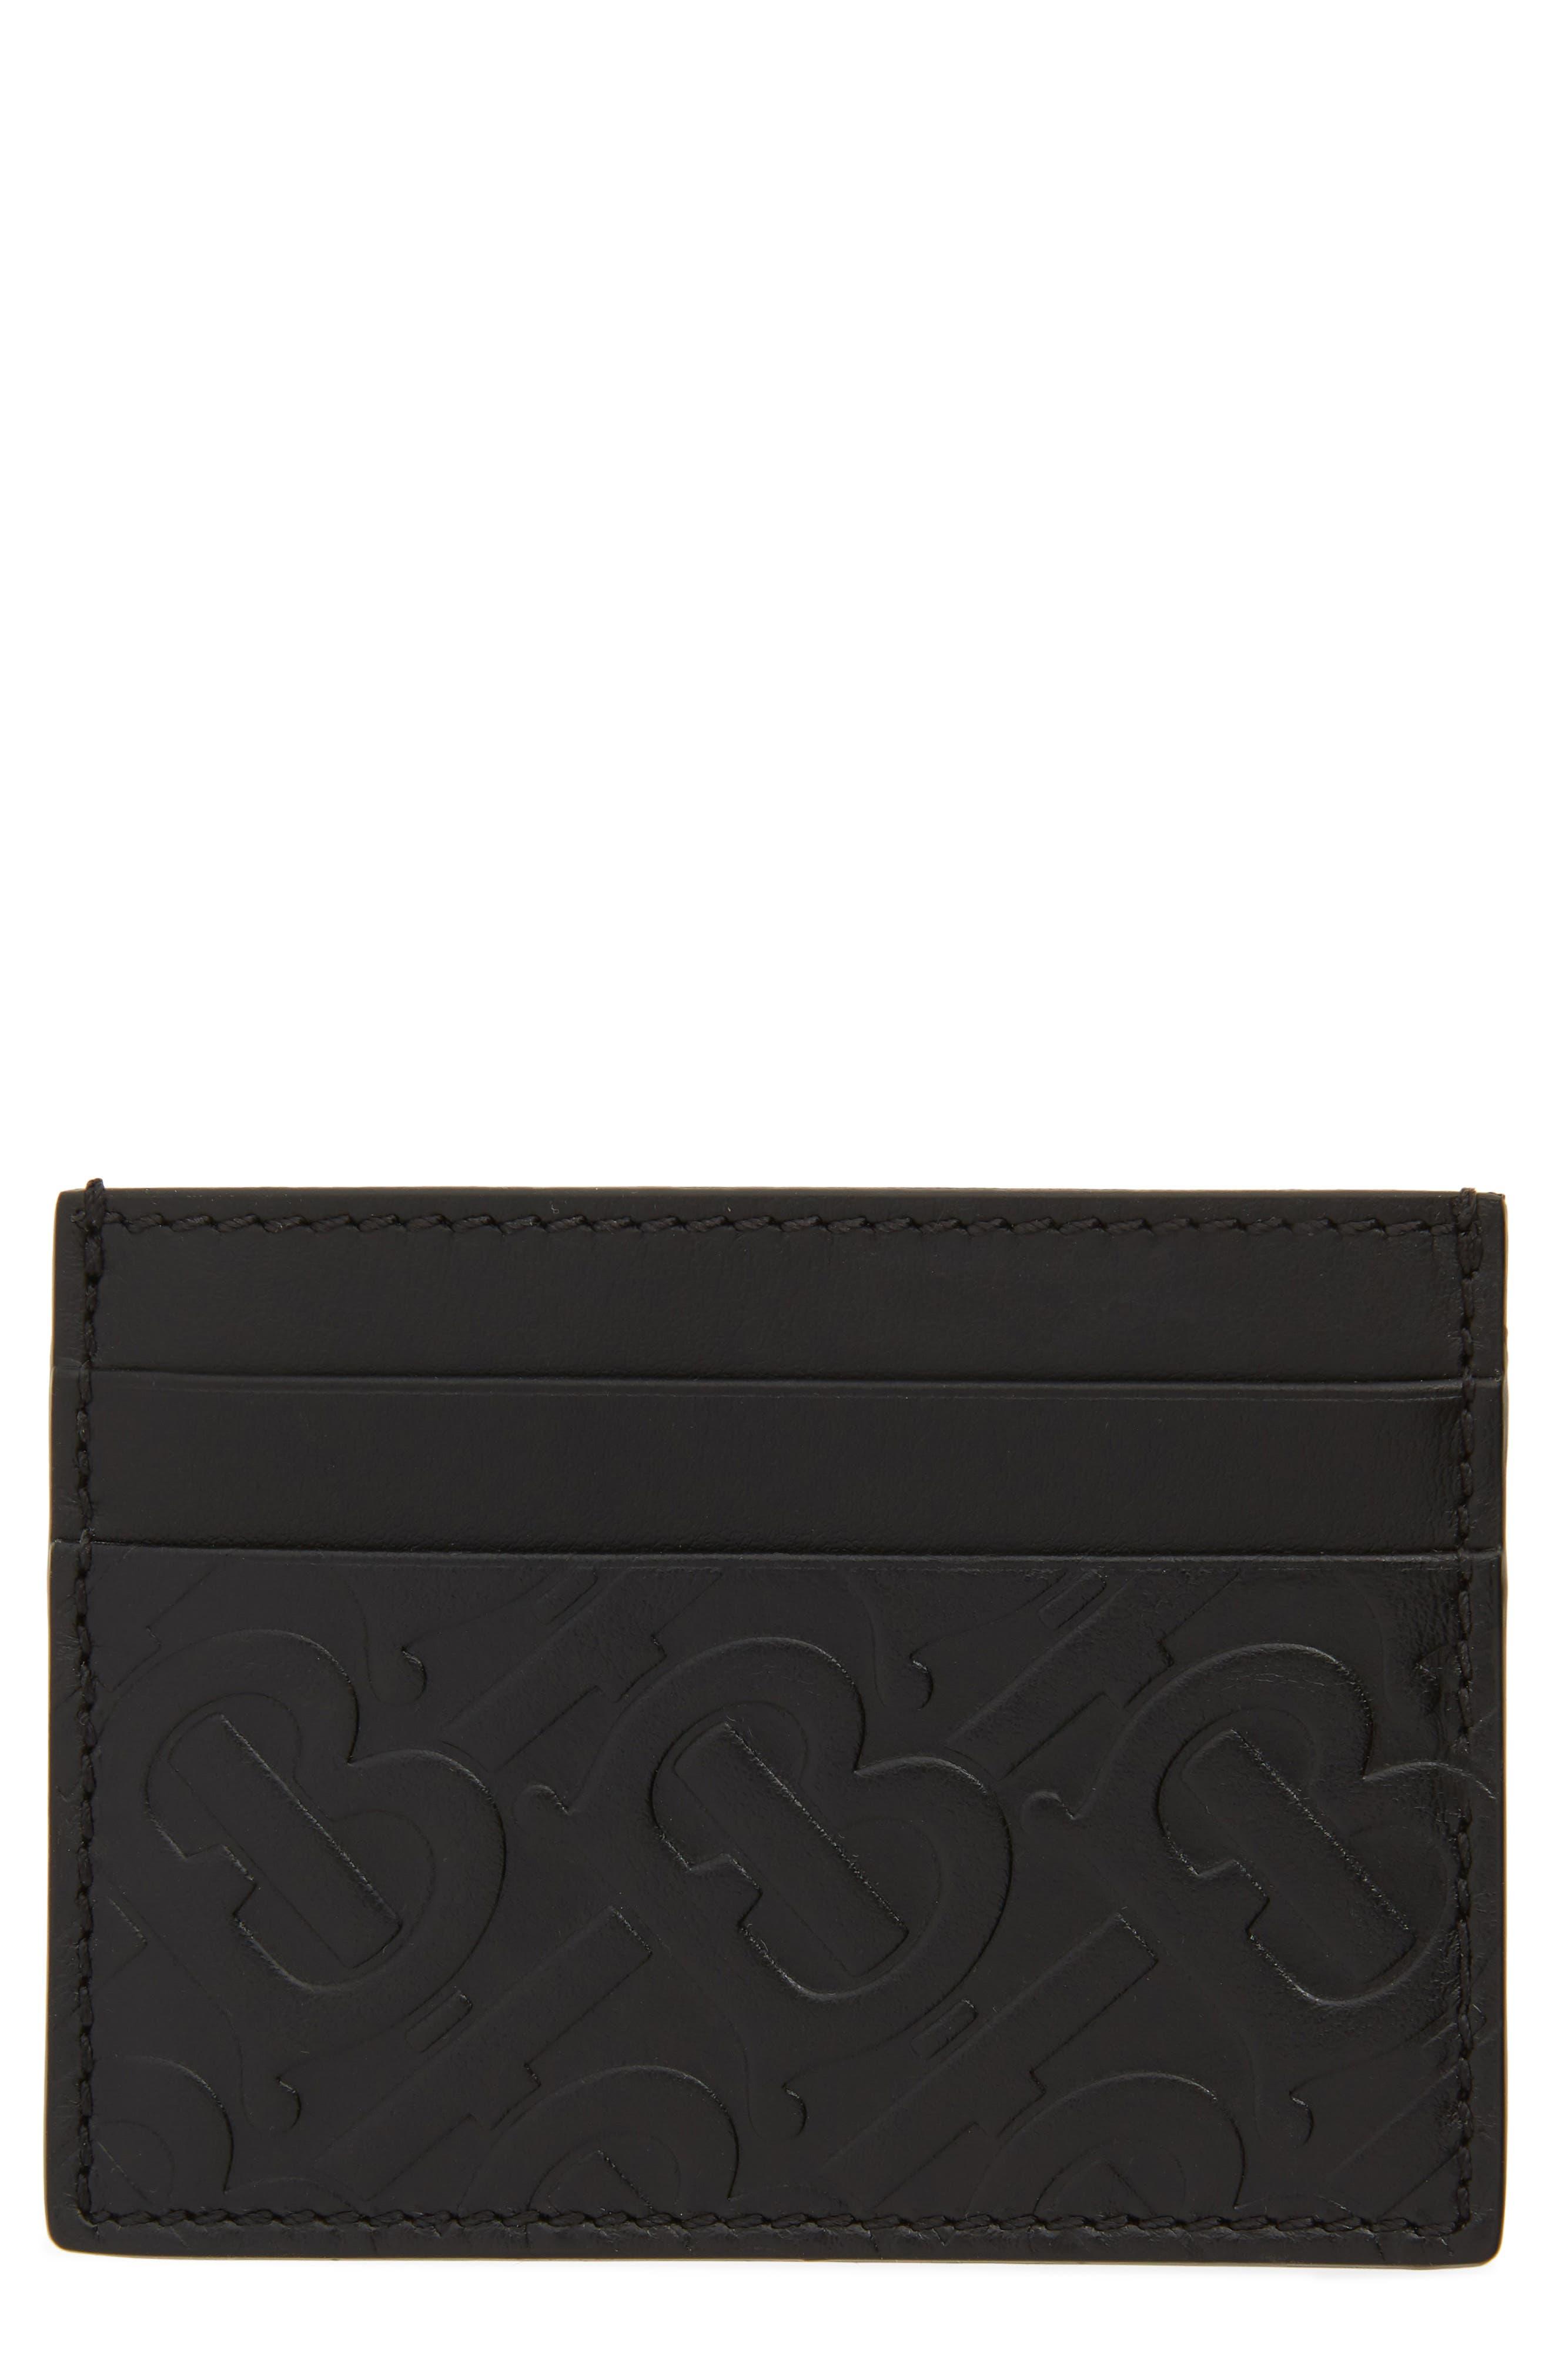 BURBERRY, Sandon Monogram Leather Card Case, Main thumbnail 1, color, BLACK